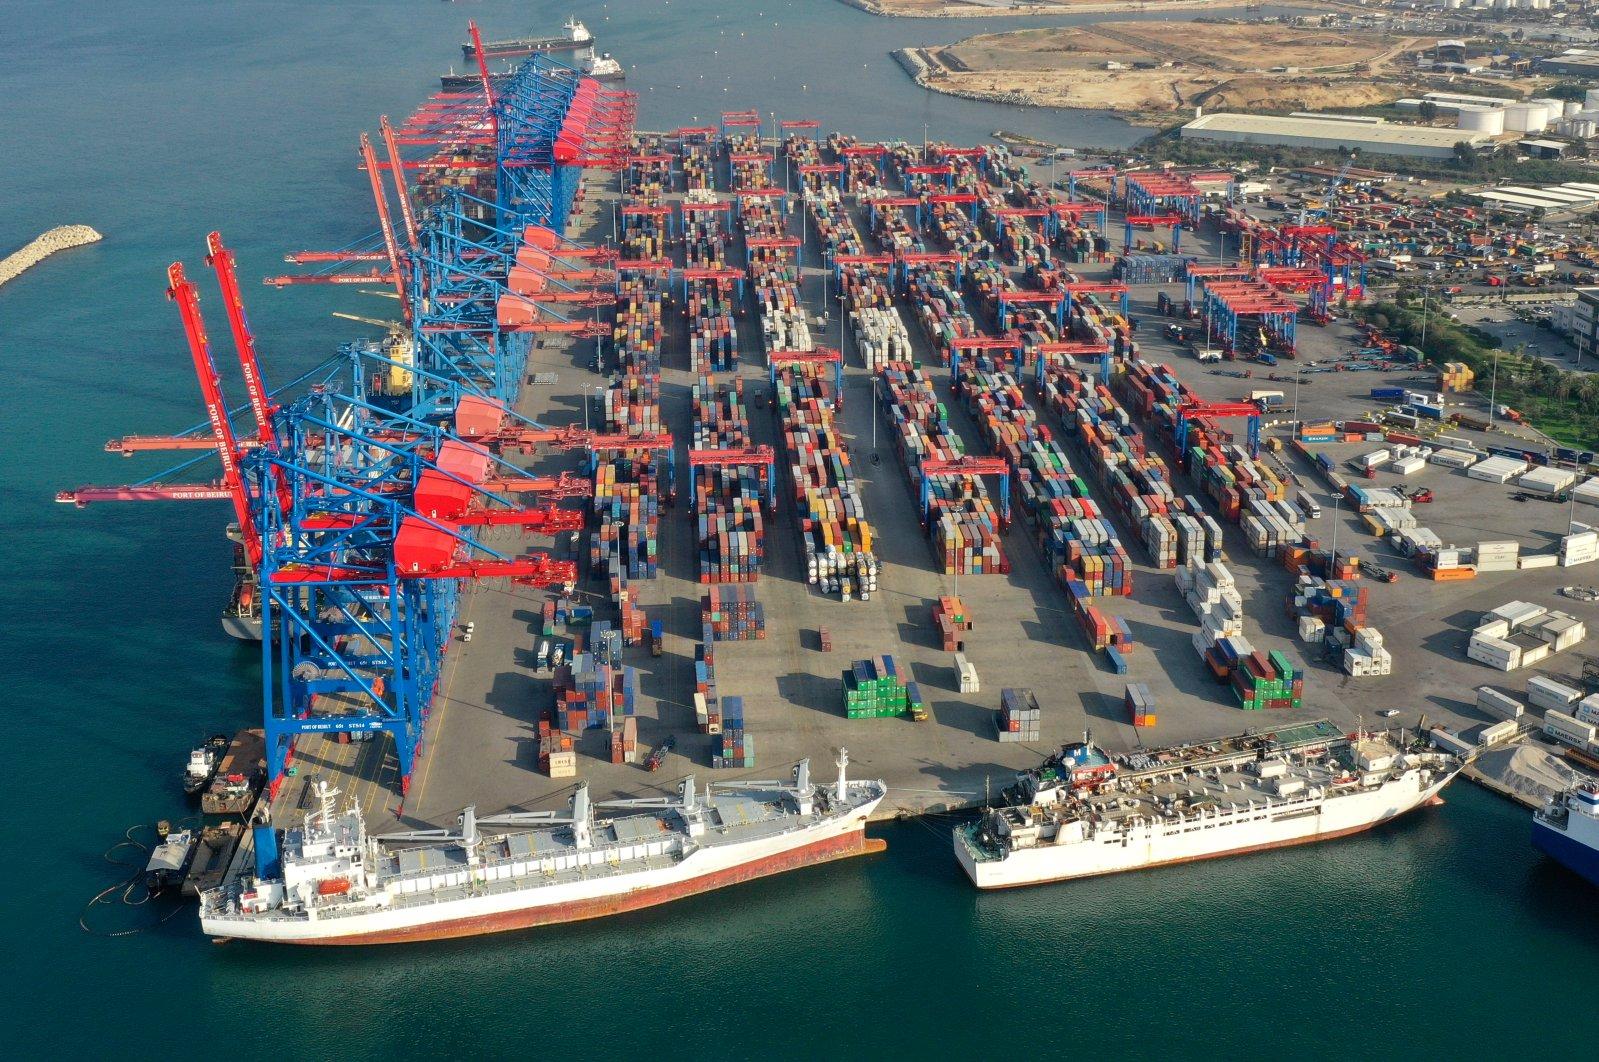 This Nov. 30, 2018 file photo shows an aerial view of a seaport terminal, Beirut, Lebanon. (AP Photo)